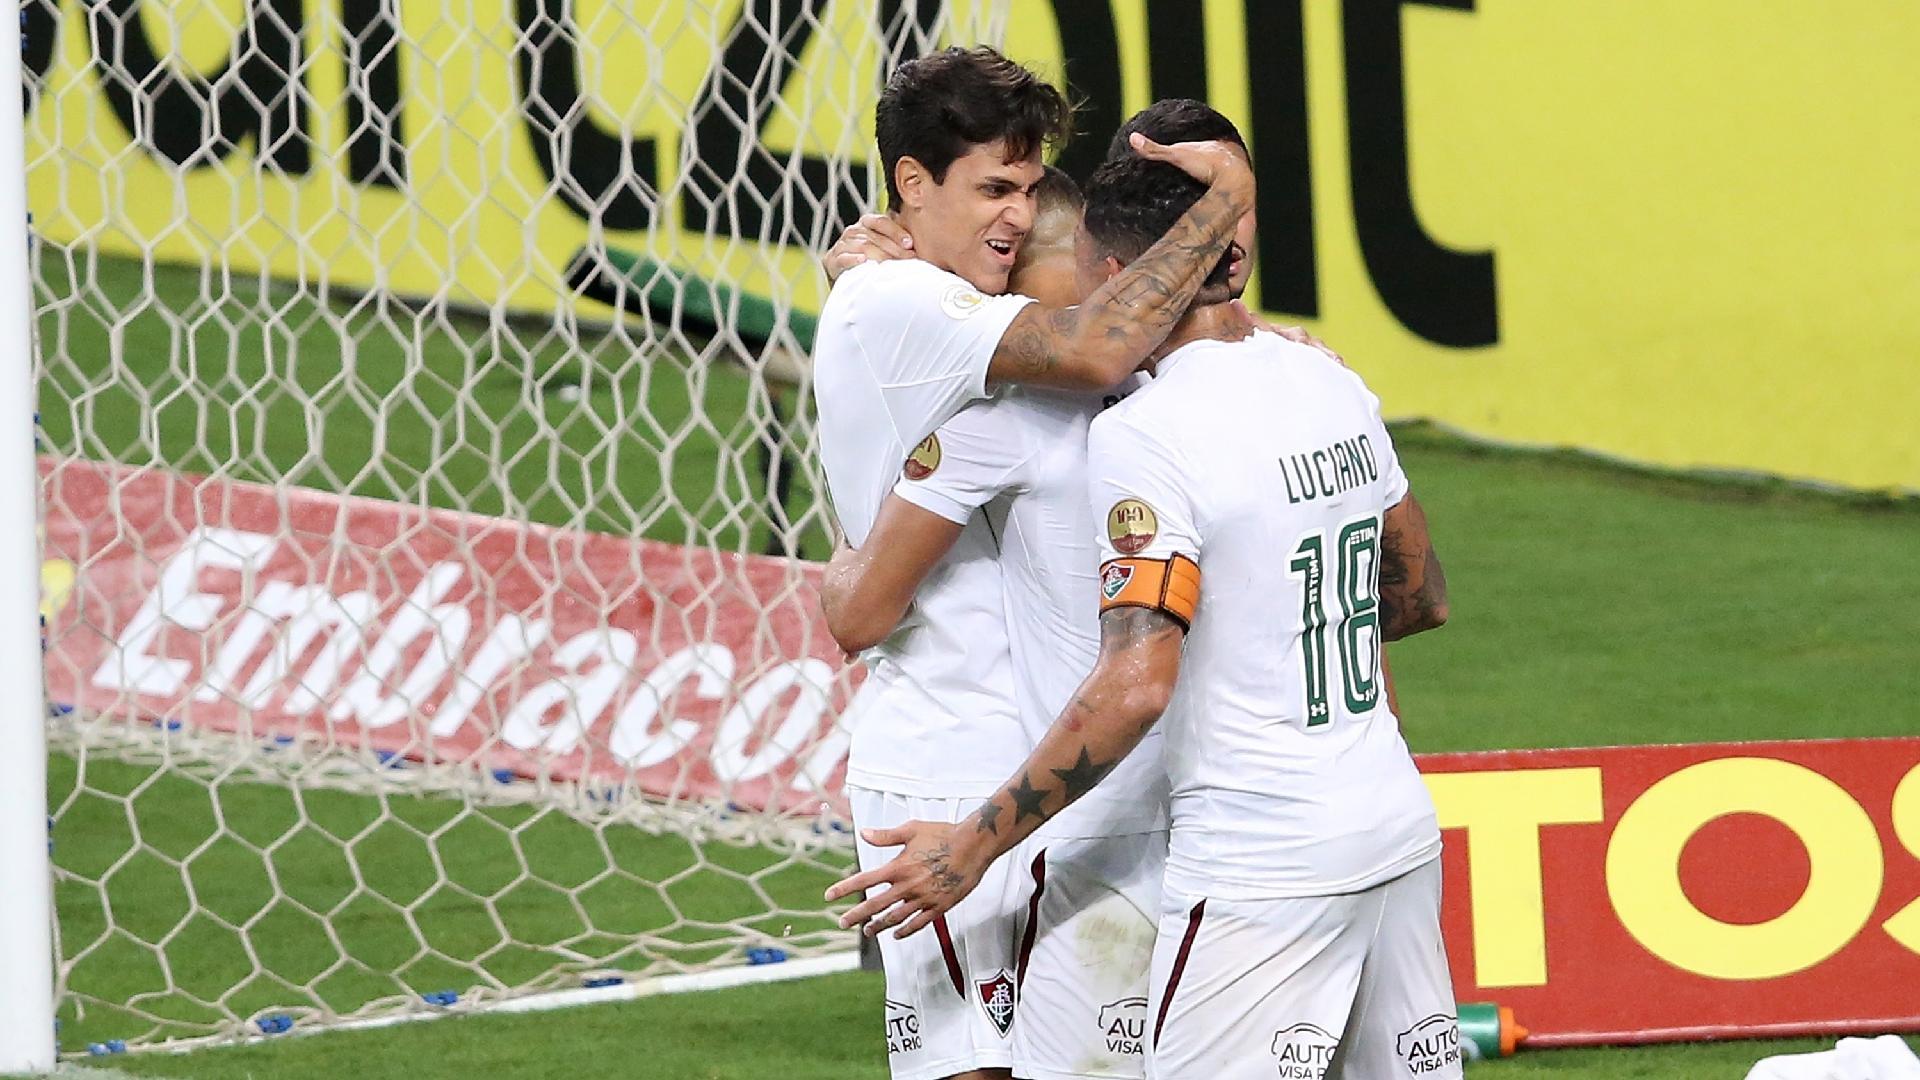 Jogadores comemoram gol de Pedro durante Grêmio x Fluminense